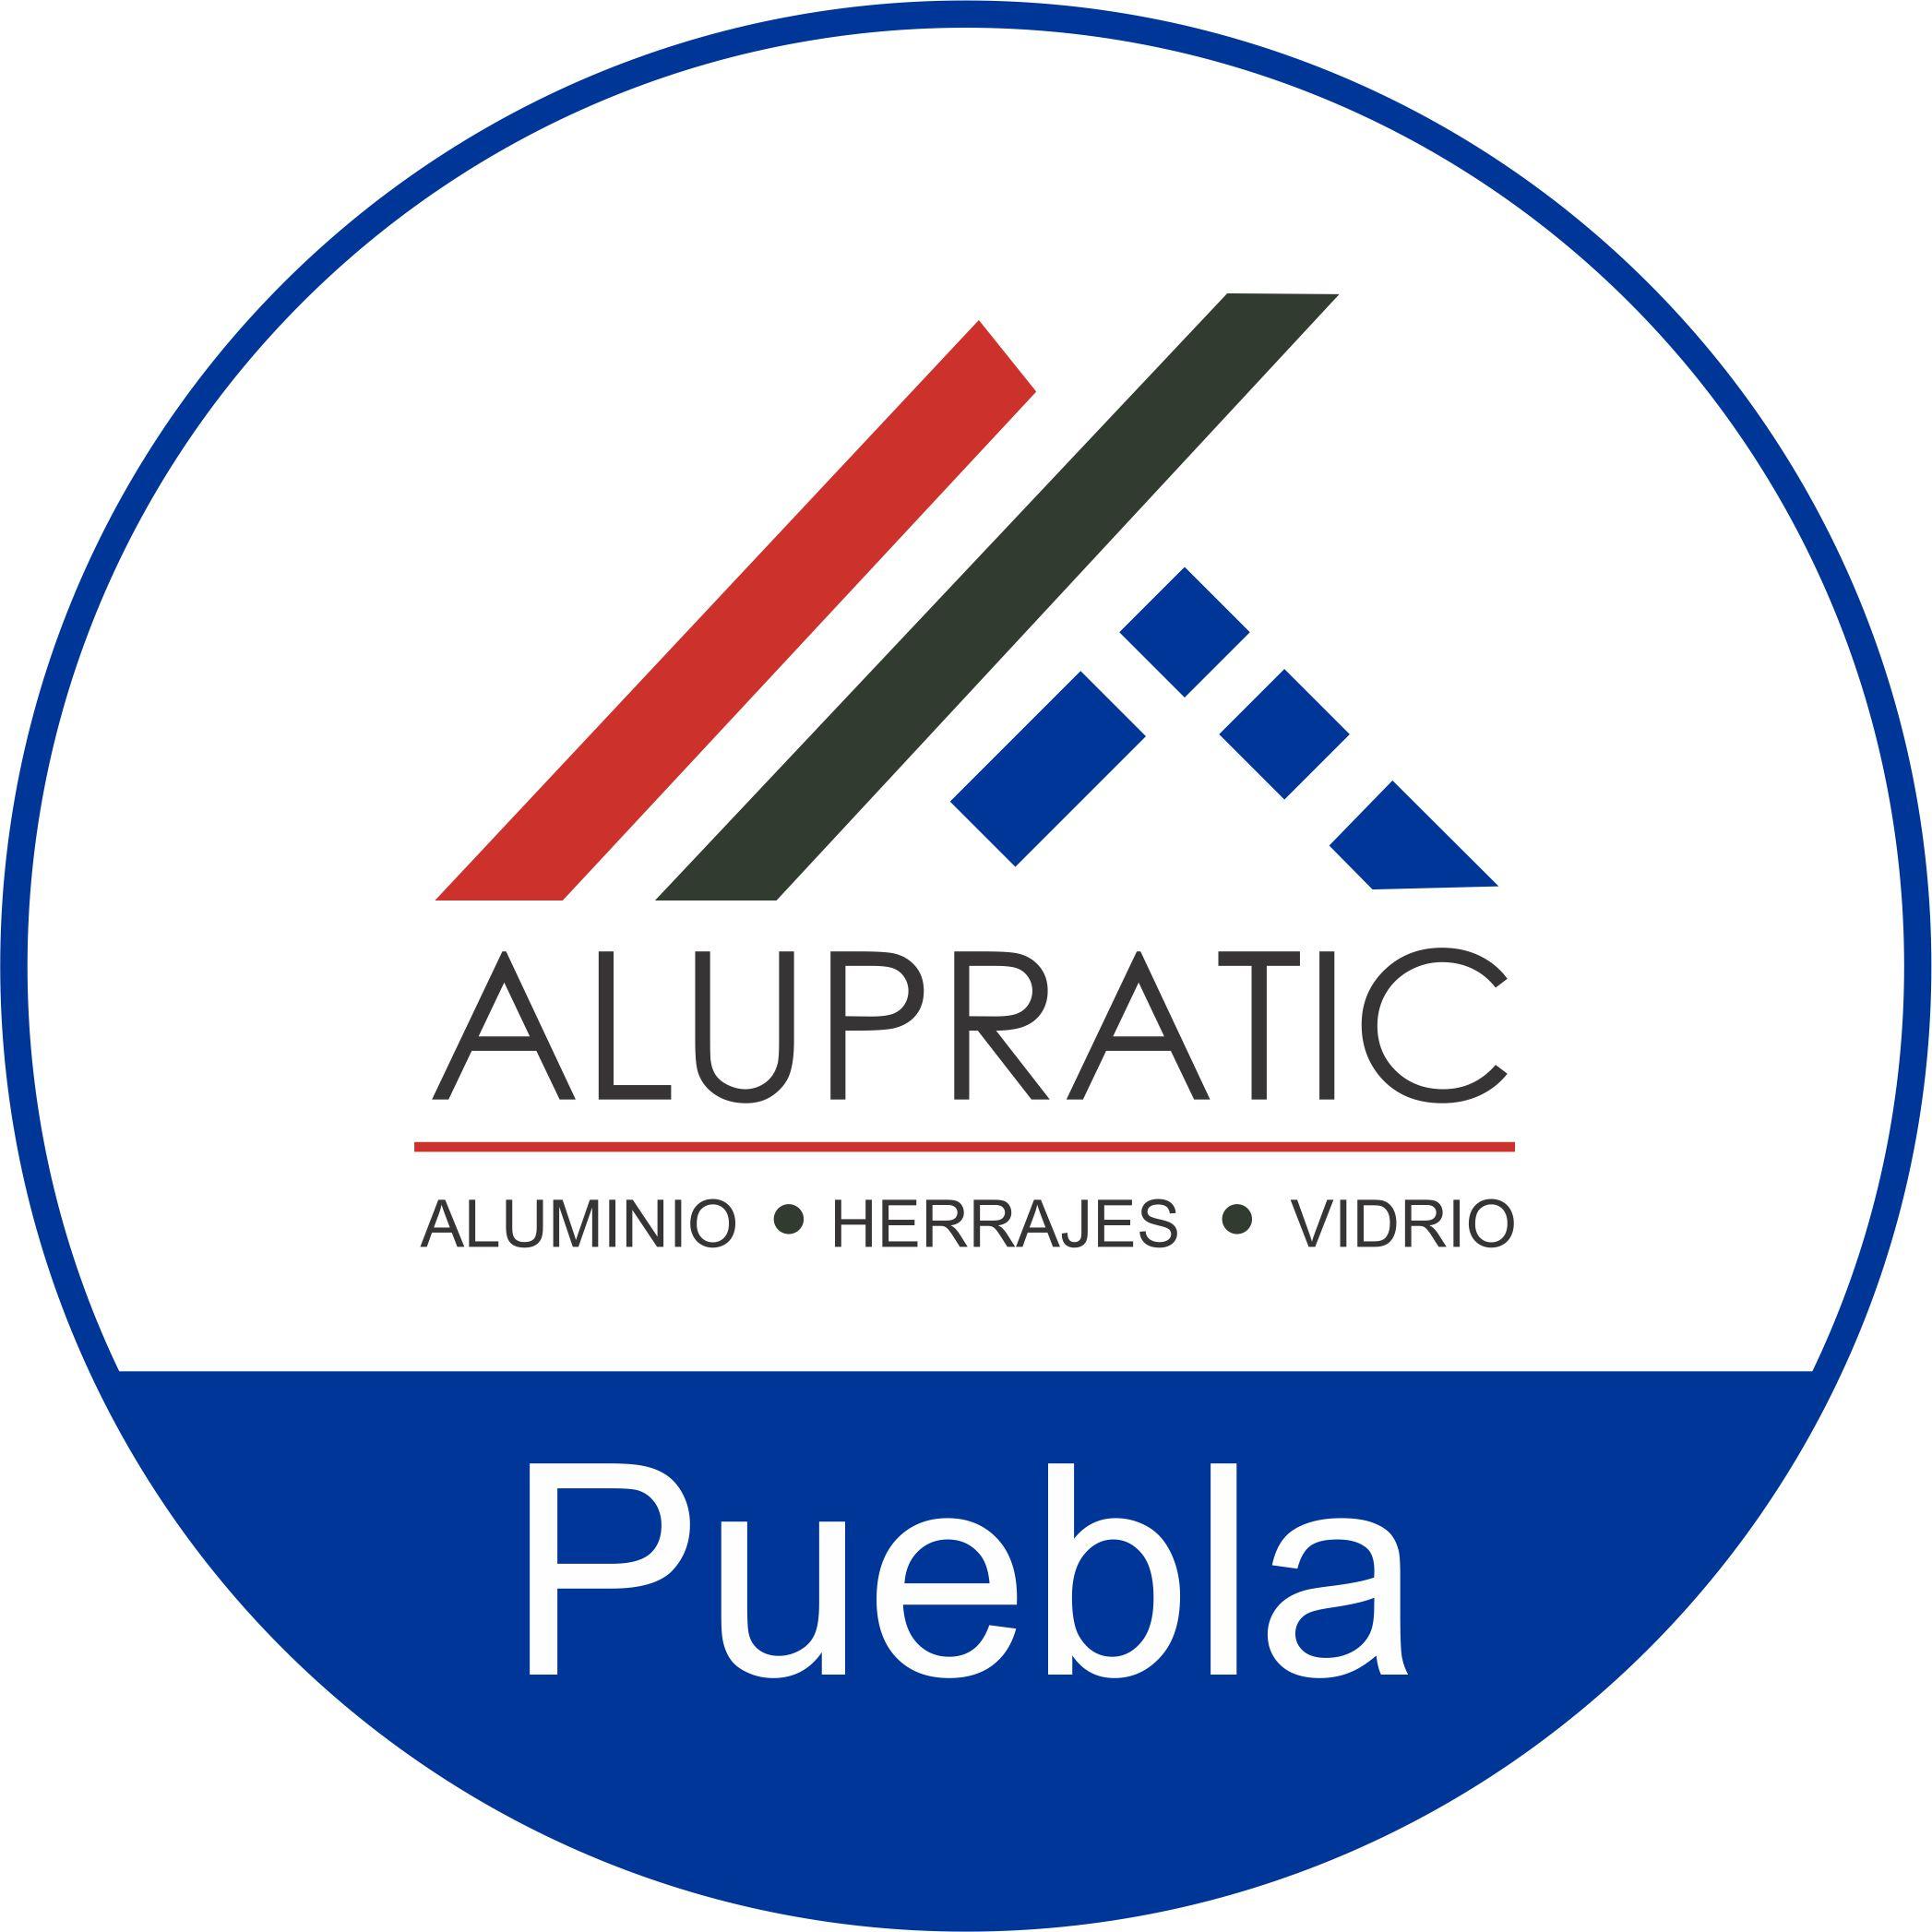 Alupratic Puebla